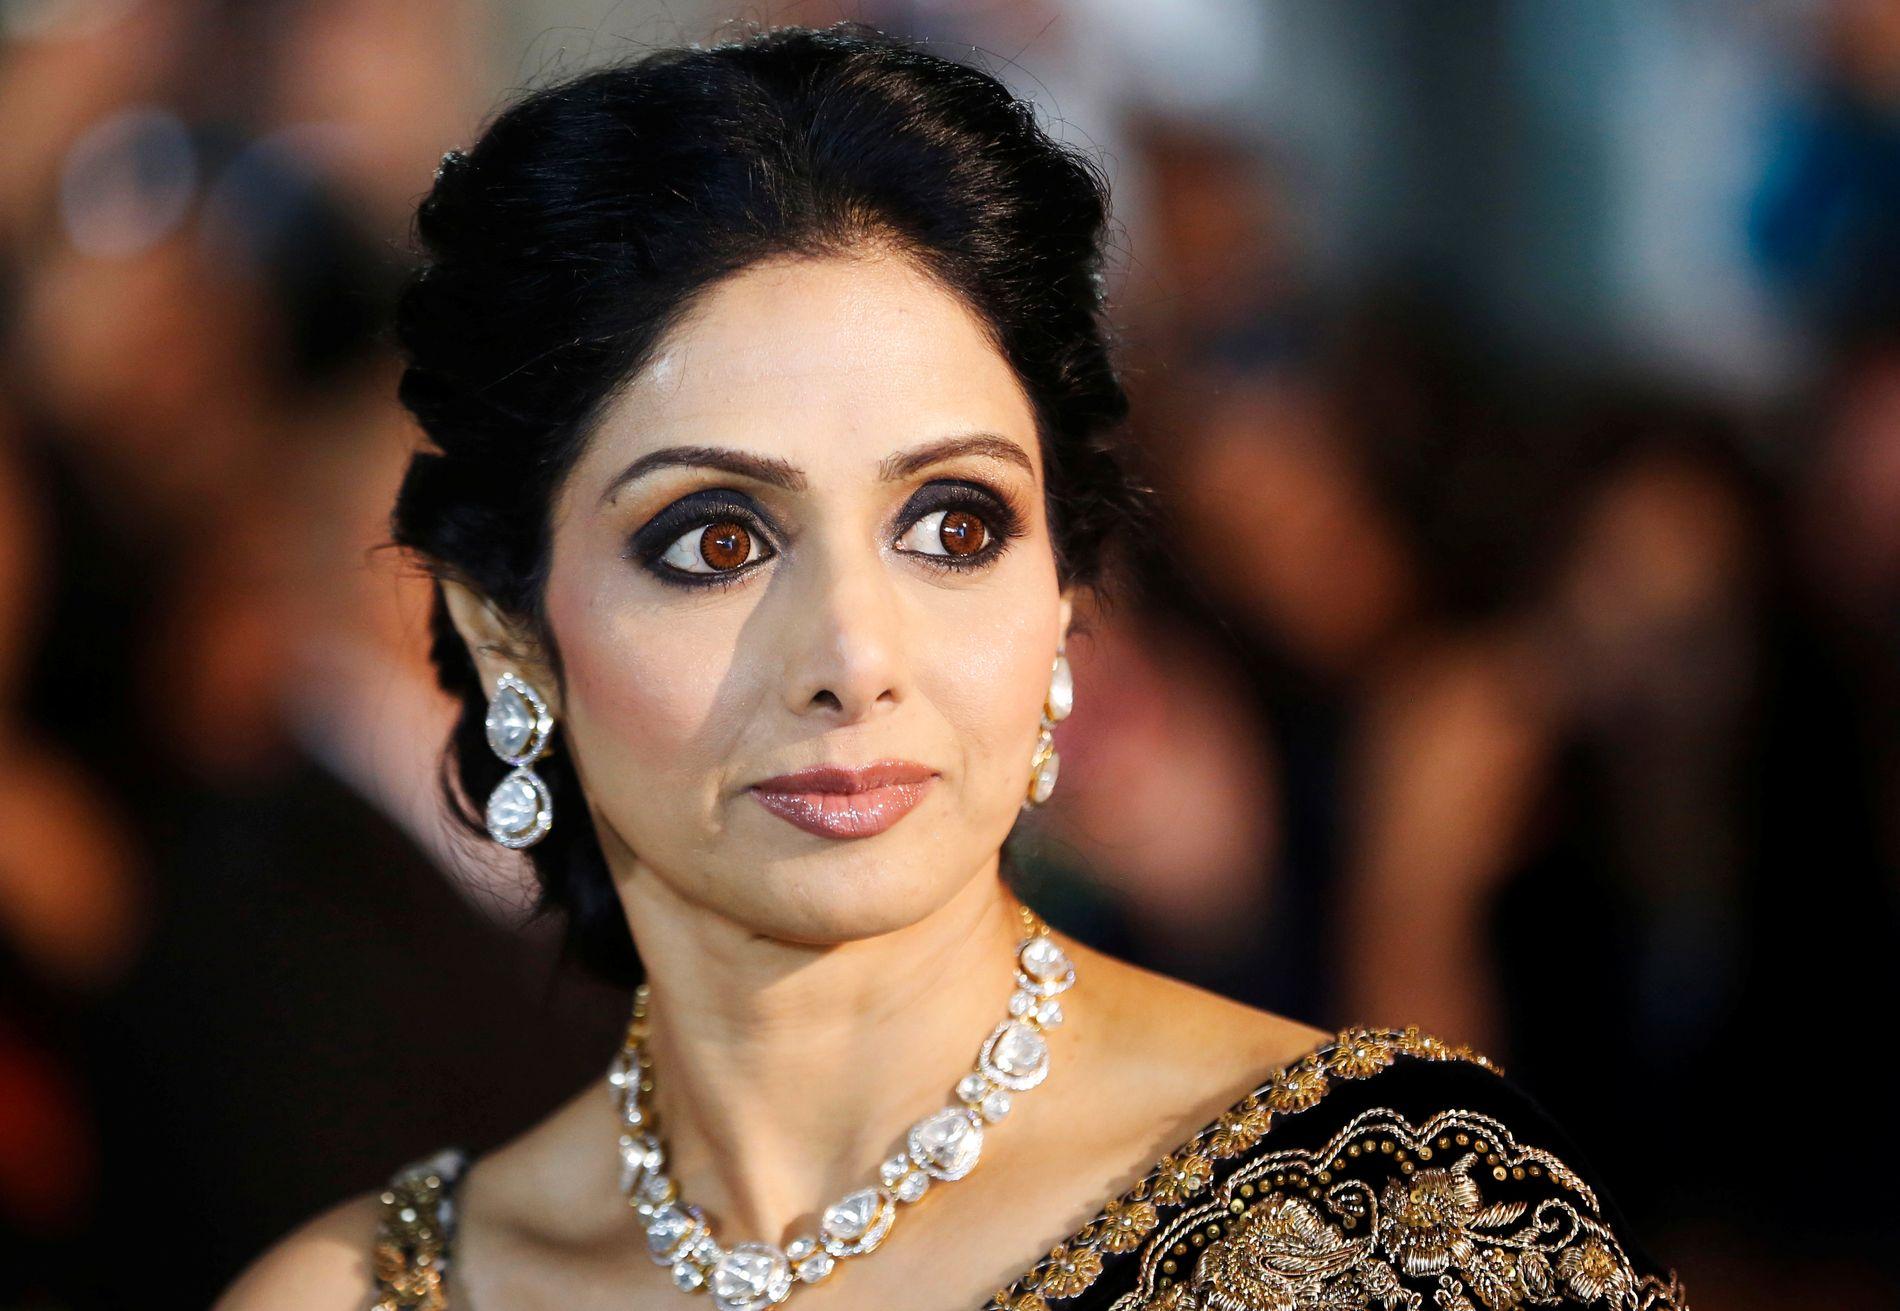 DRUKNET I BADEKARET: Gulf News skriver at filmstjernen  Sridevi Kapoor druknet i badekaret på hotellrommet.